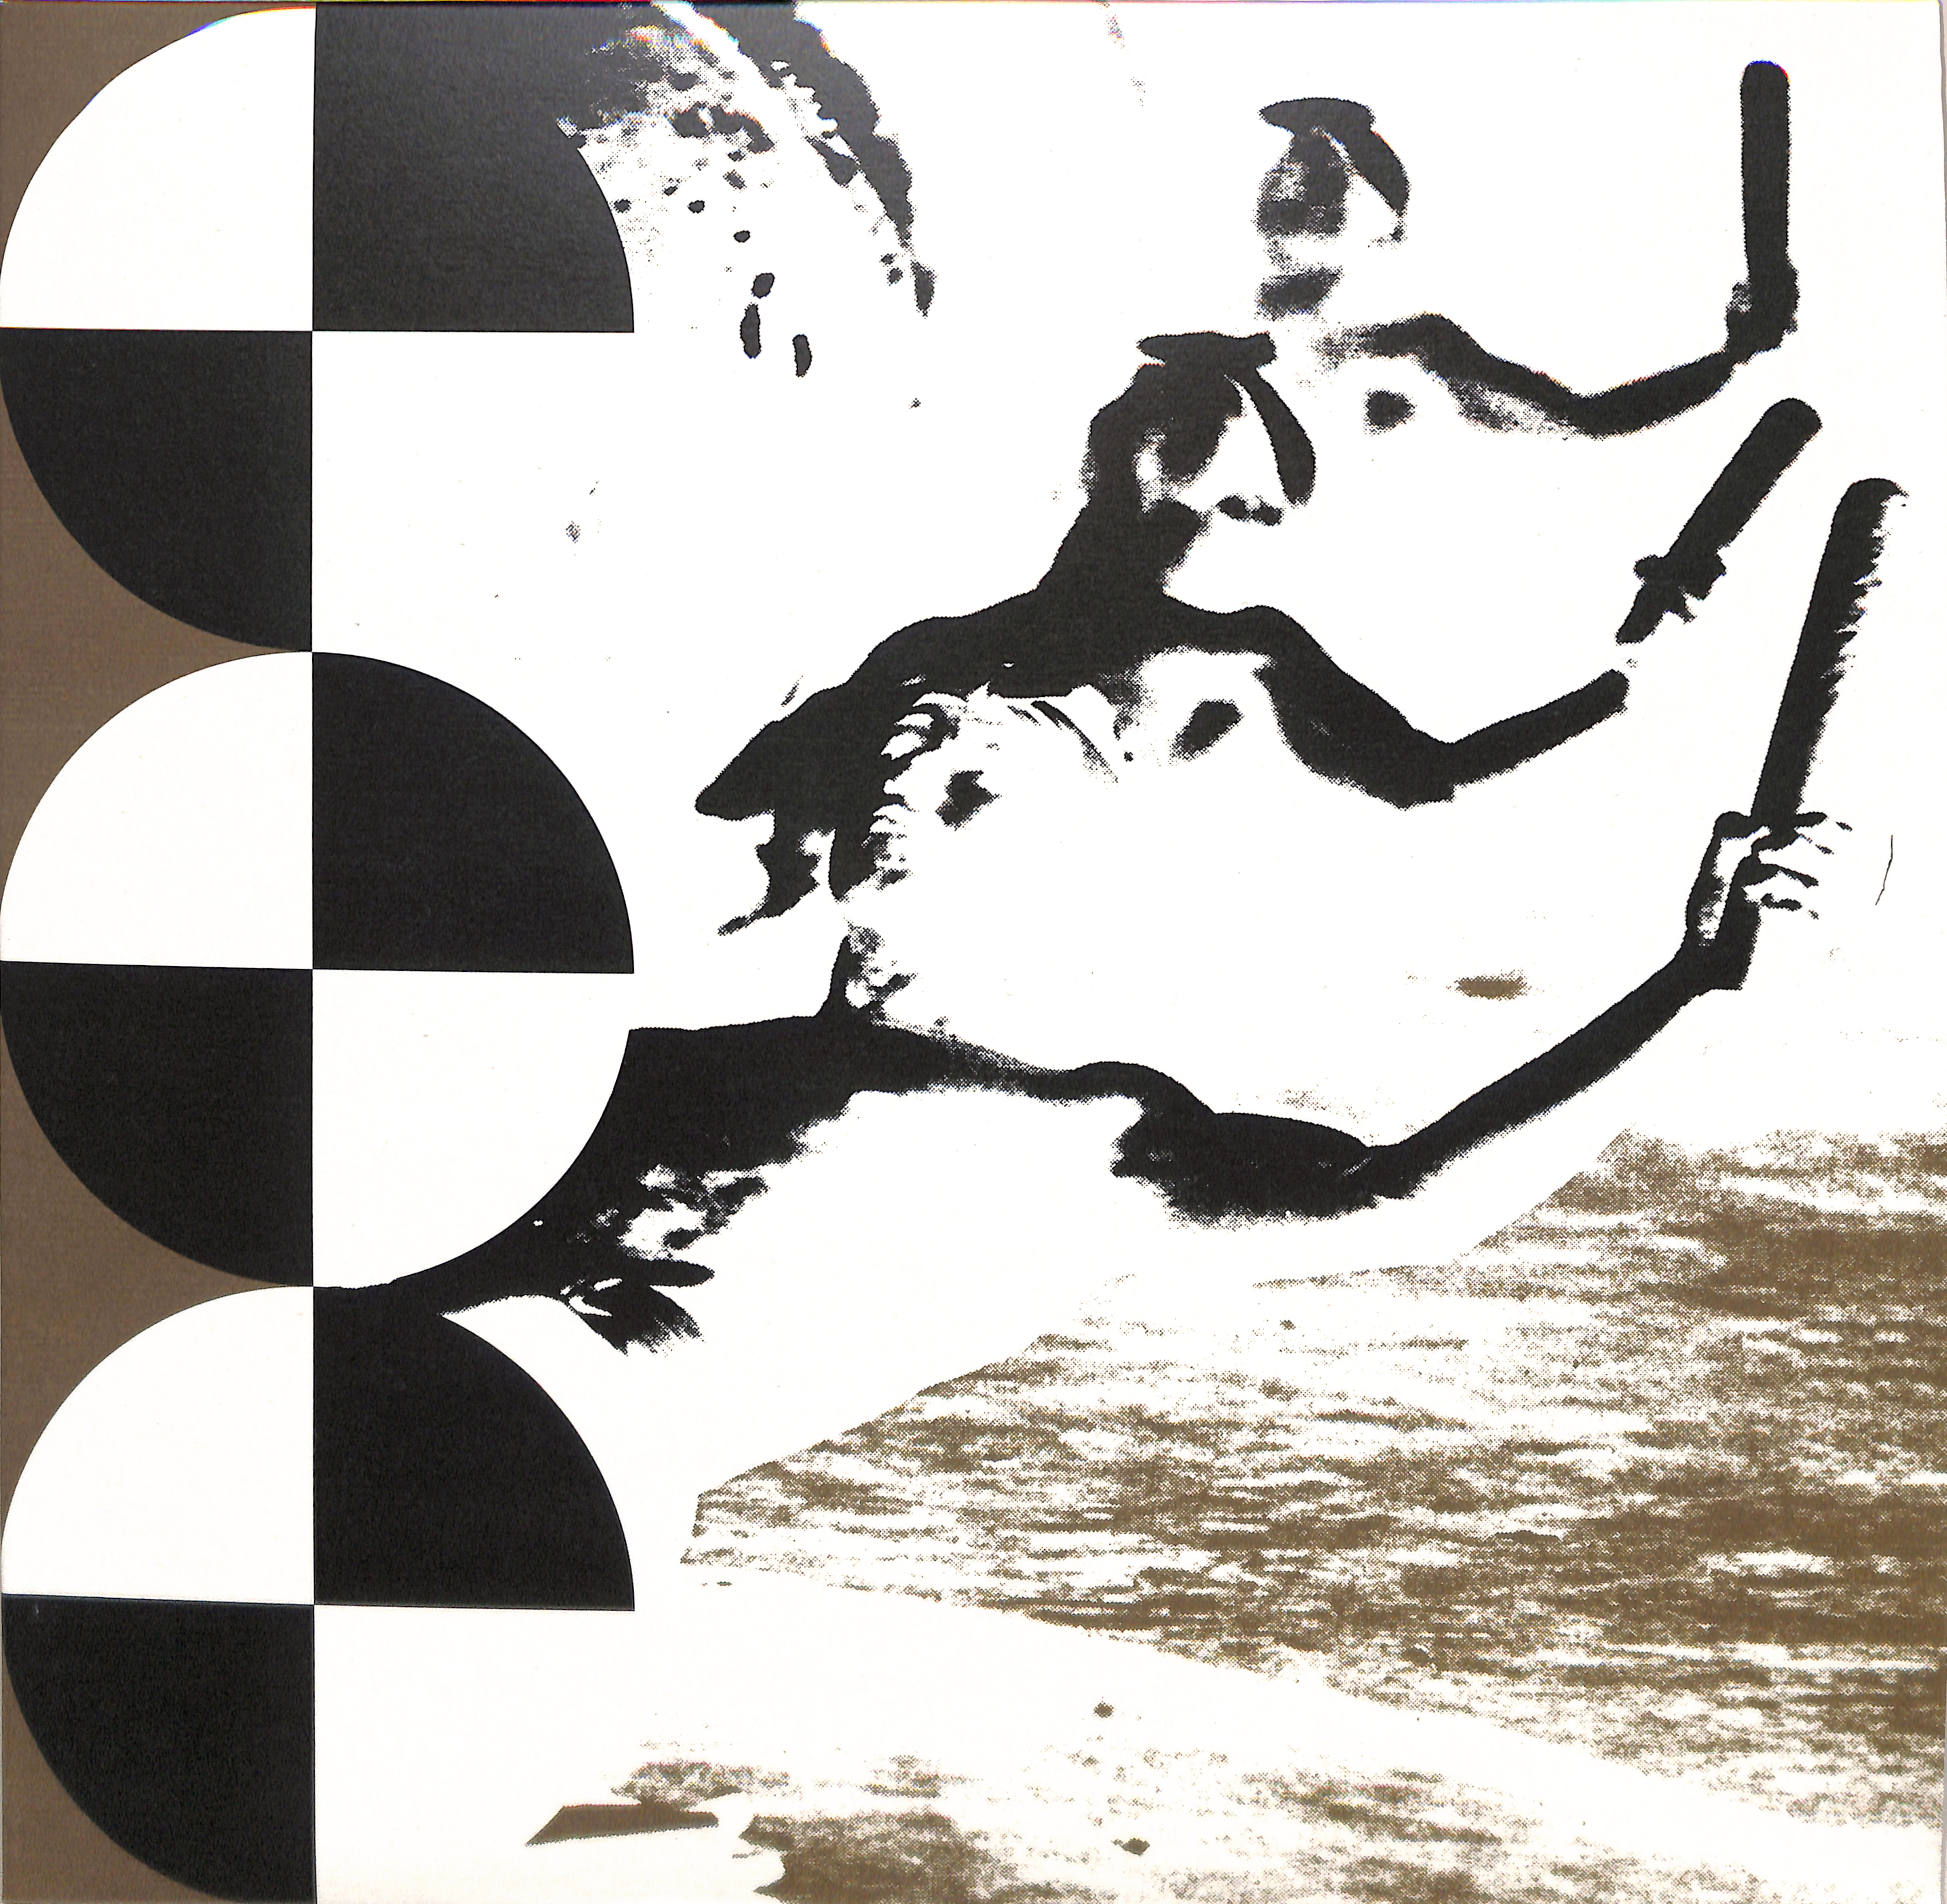 Raffaele Attanasio - BOHEMIAN GROVE EP